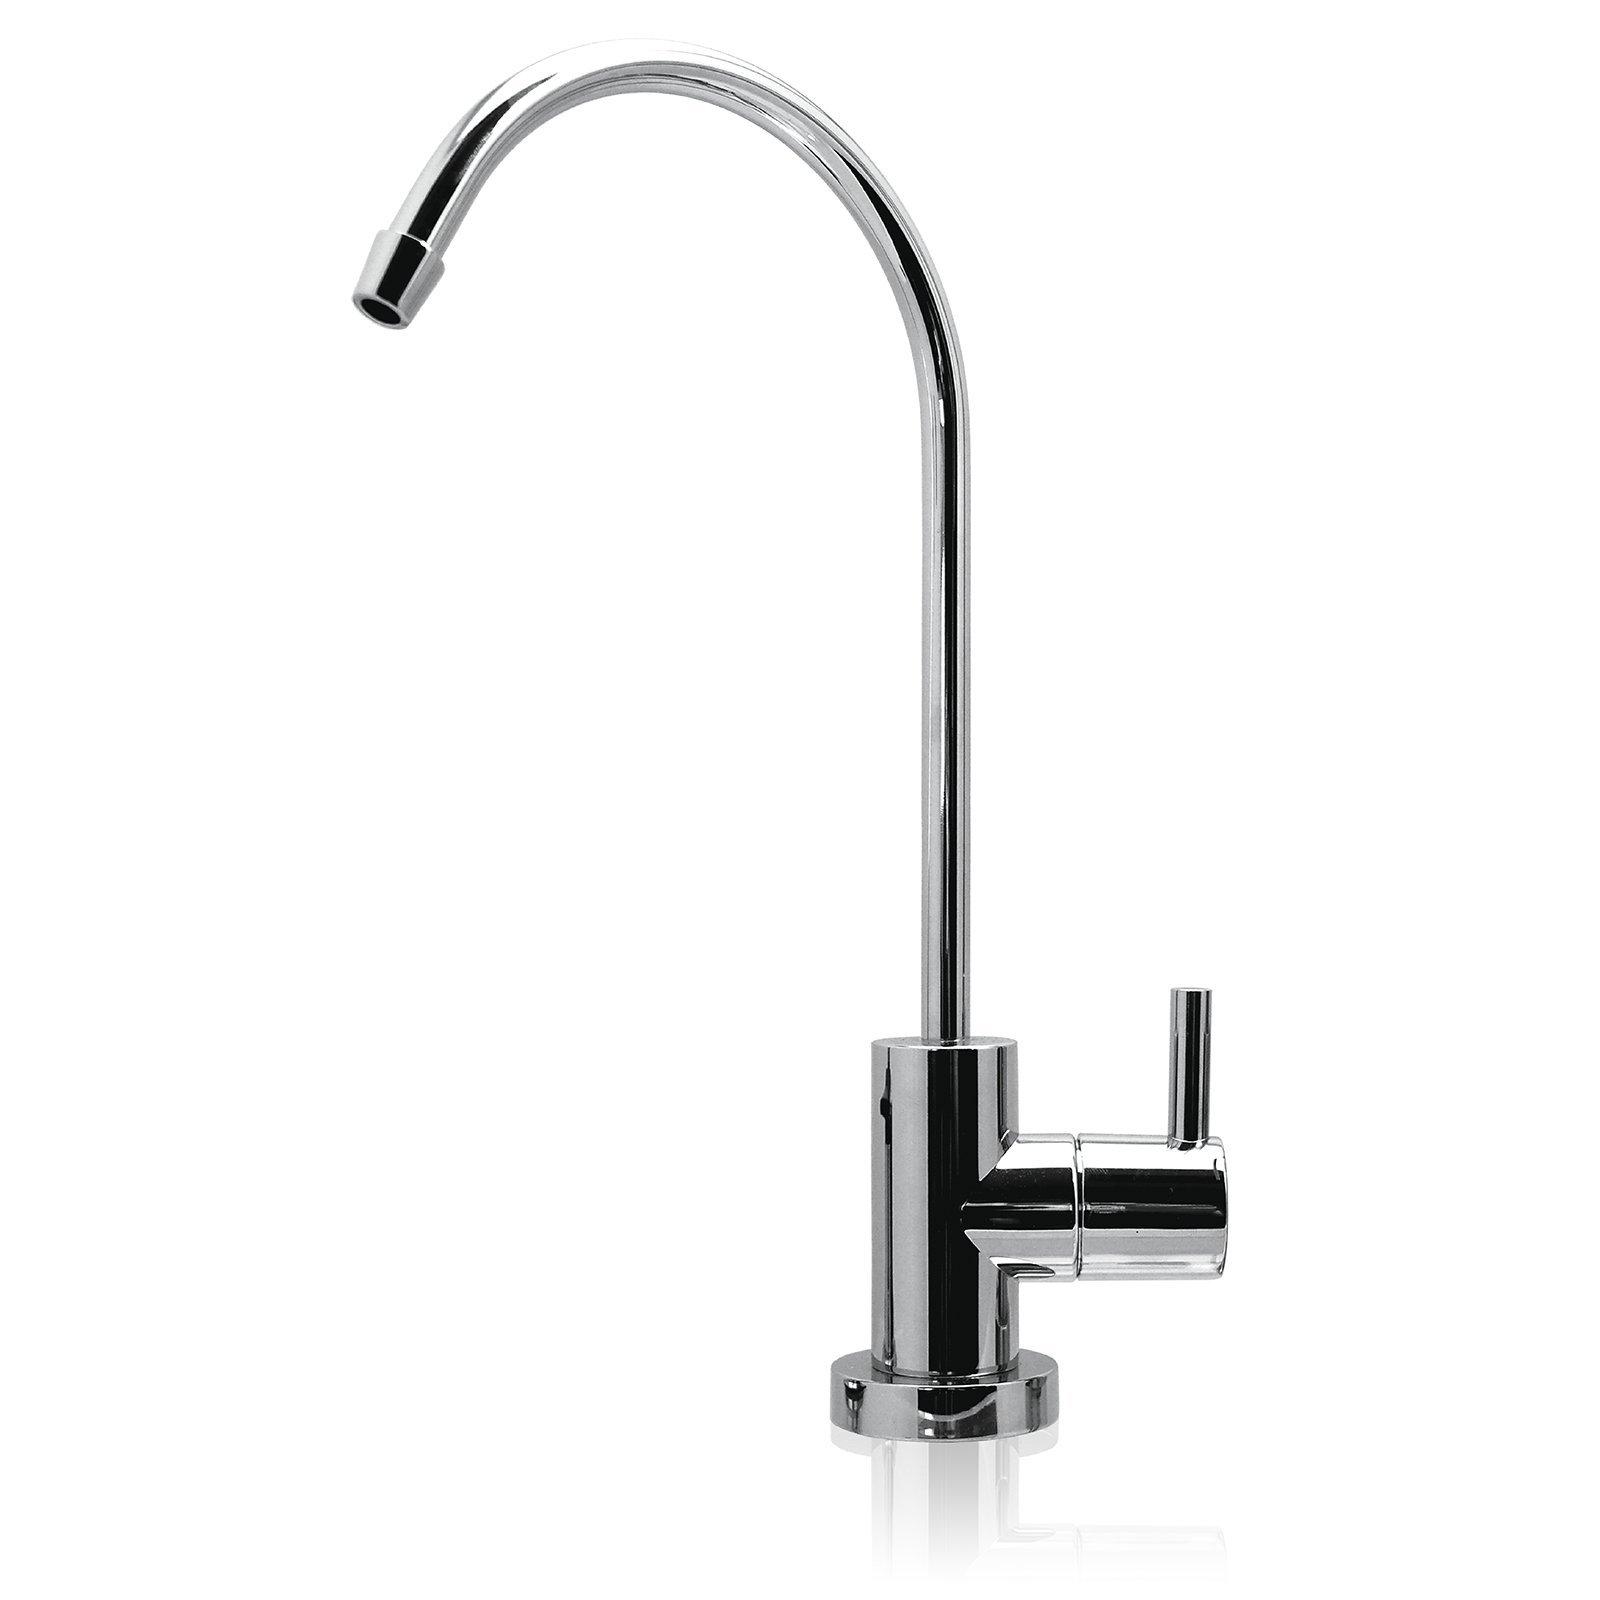 MODERN Ceramic Disc Designer Faucet Coke Shaped Non-Air Gap Faucet, CHROME